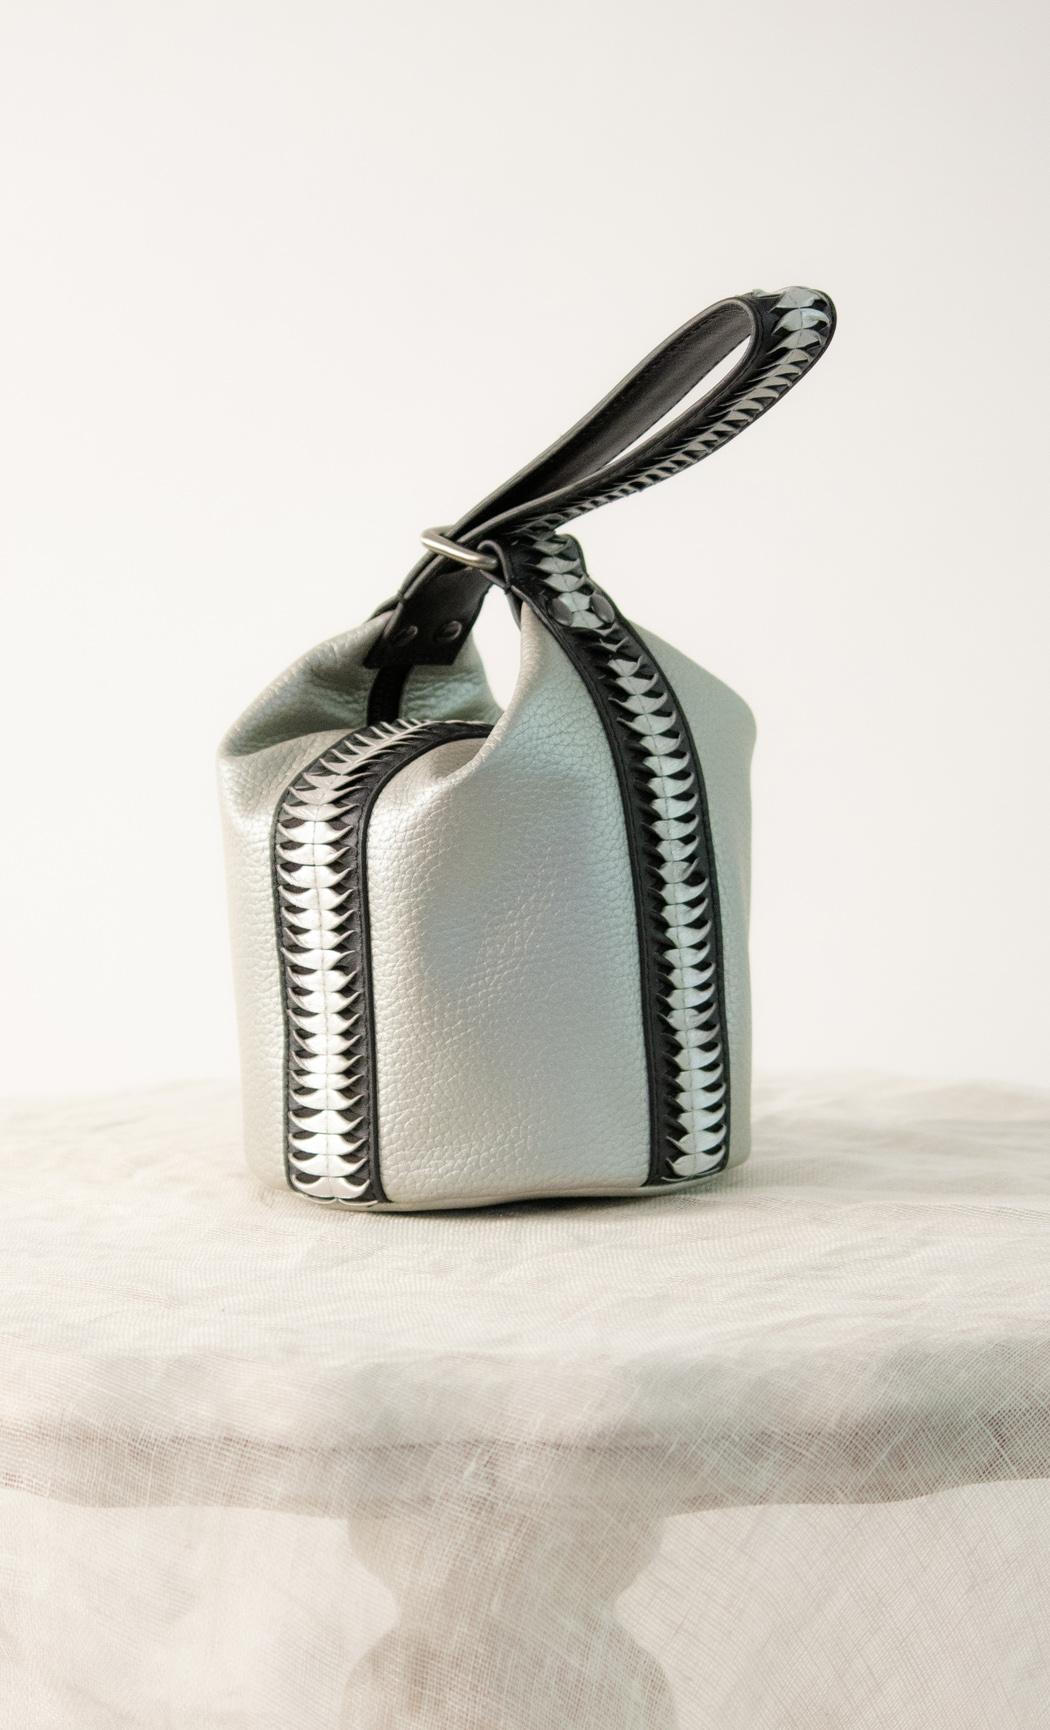 Twisted Potli in Silver-Black. Buy Online